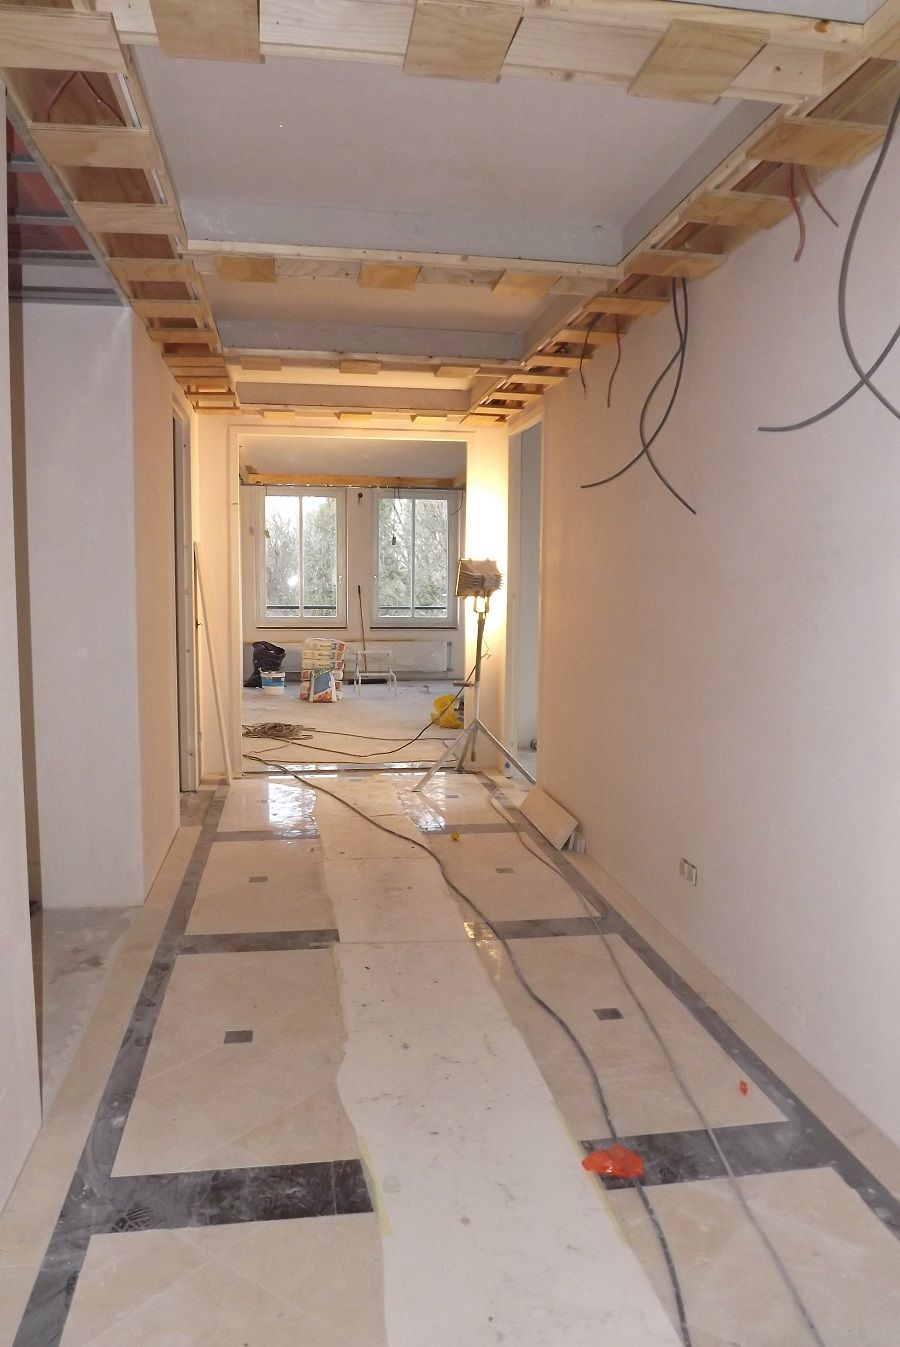 Bouw en interieur ontwerp penthouse te oudenbosch for Bouwen en interieur